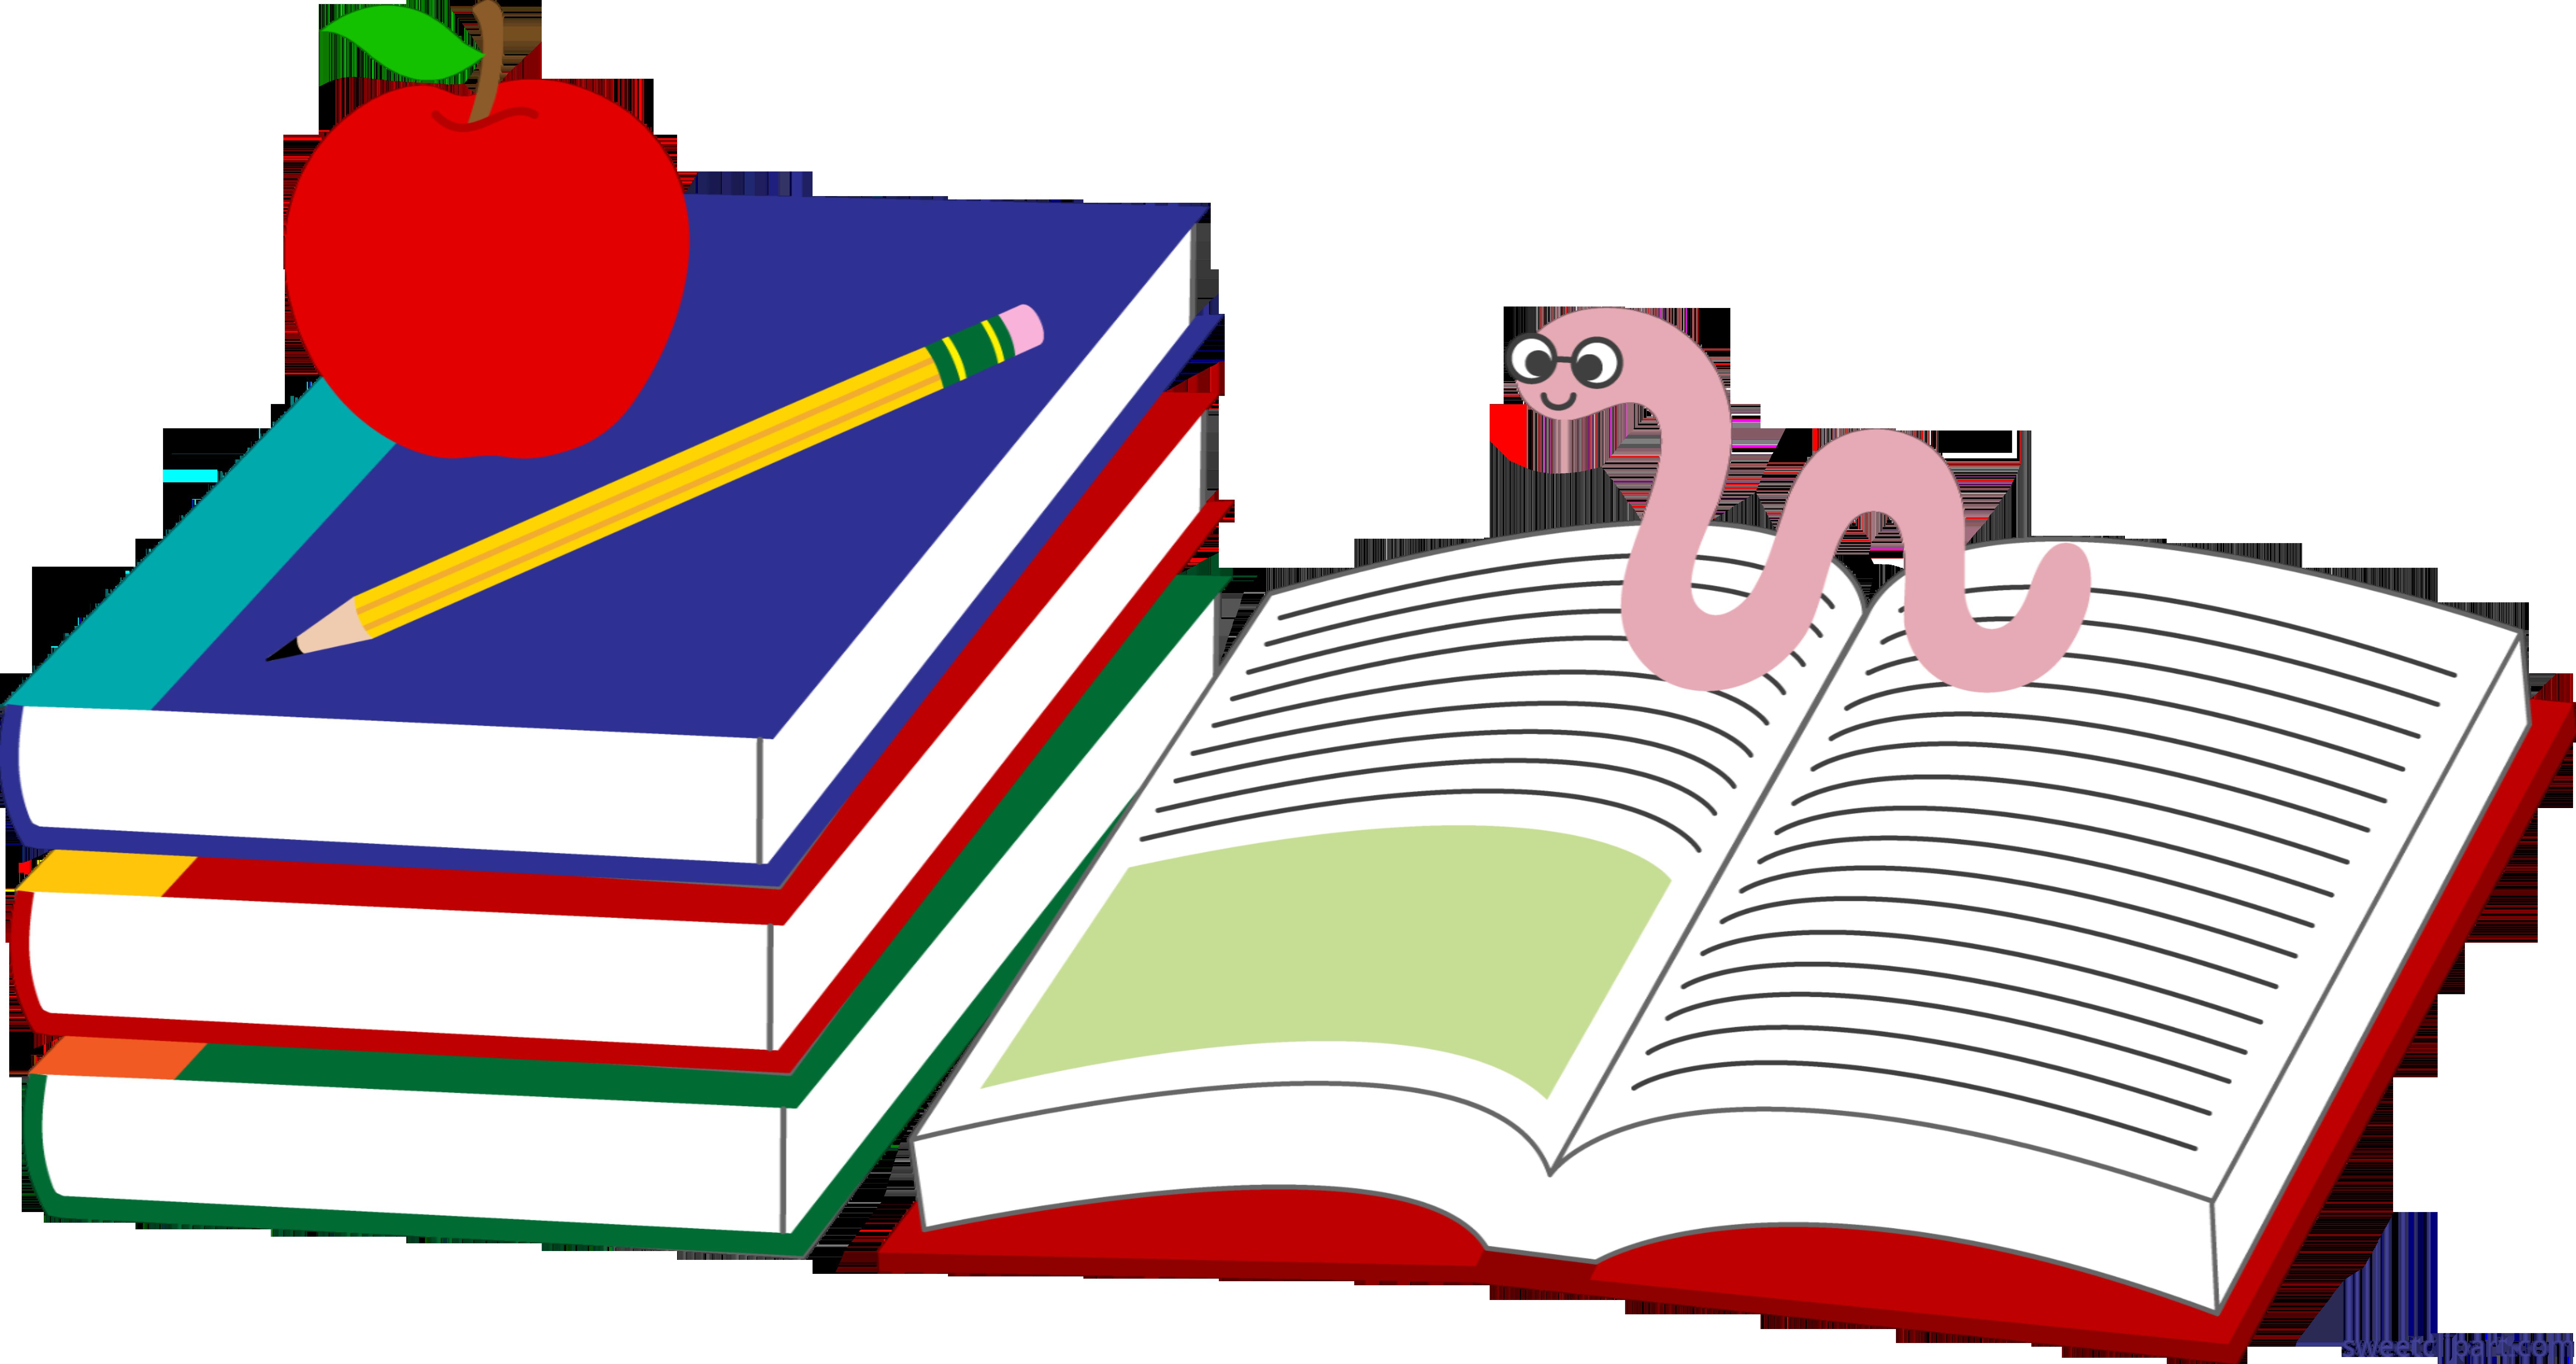 picture Books apple pencil clip. Bookworm clipart.